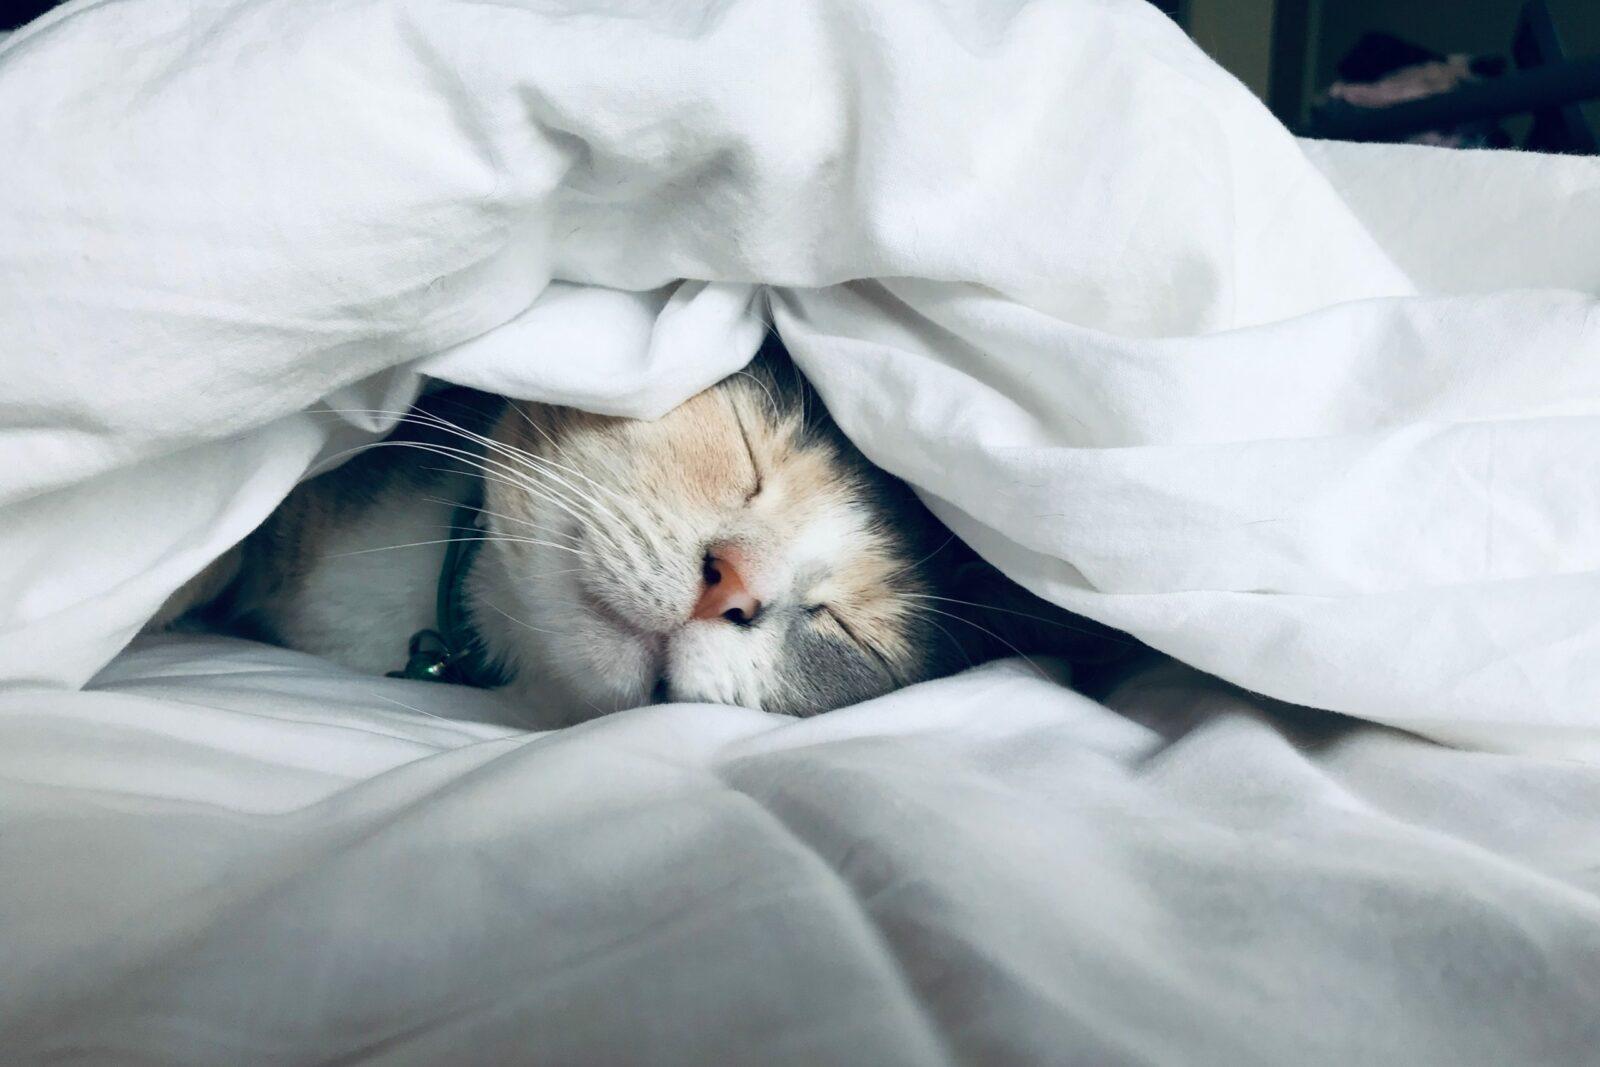 Tidur Yang Mencukupi untuk menjaga kulit anda